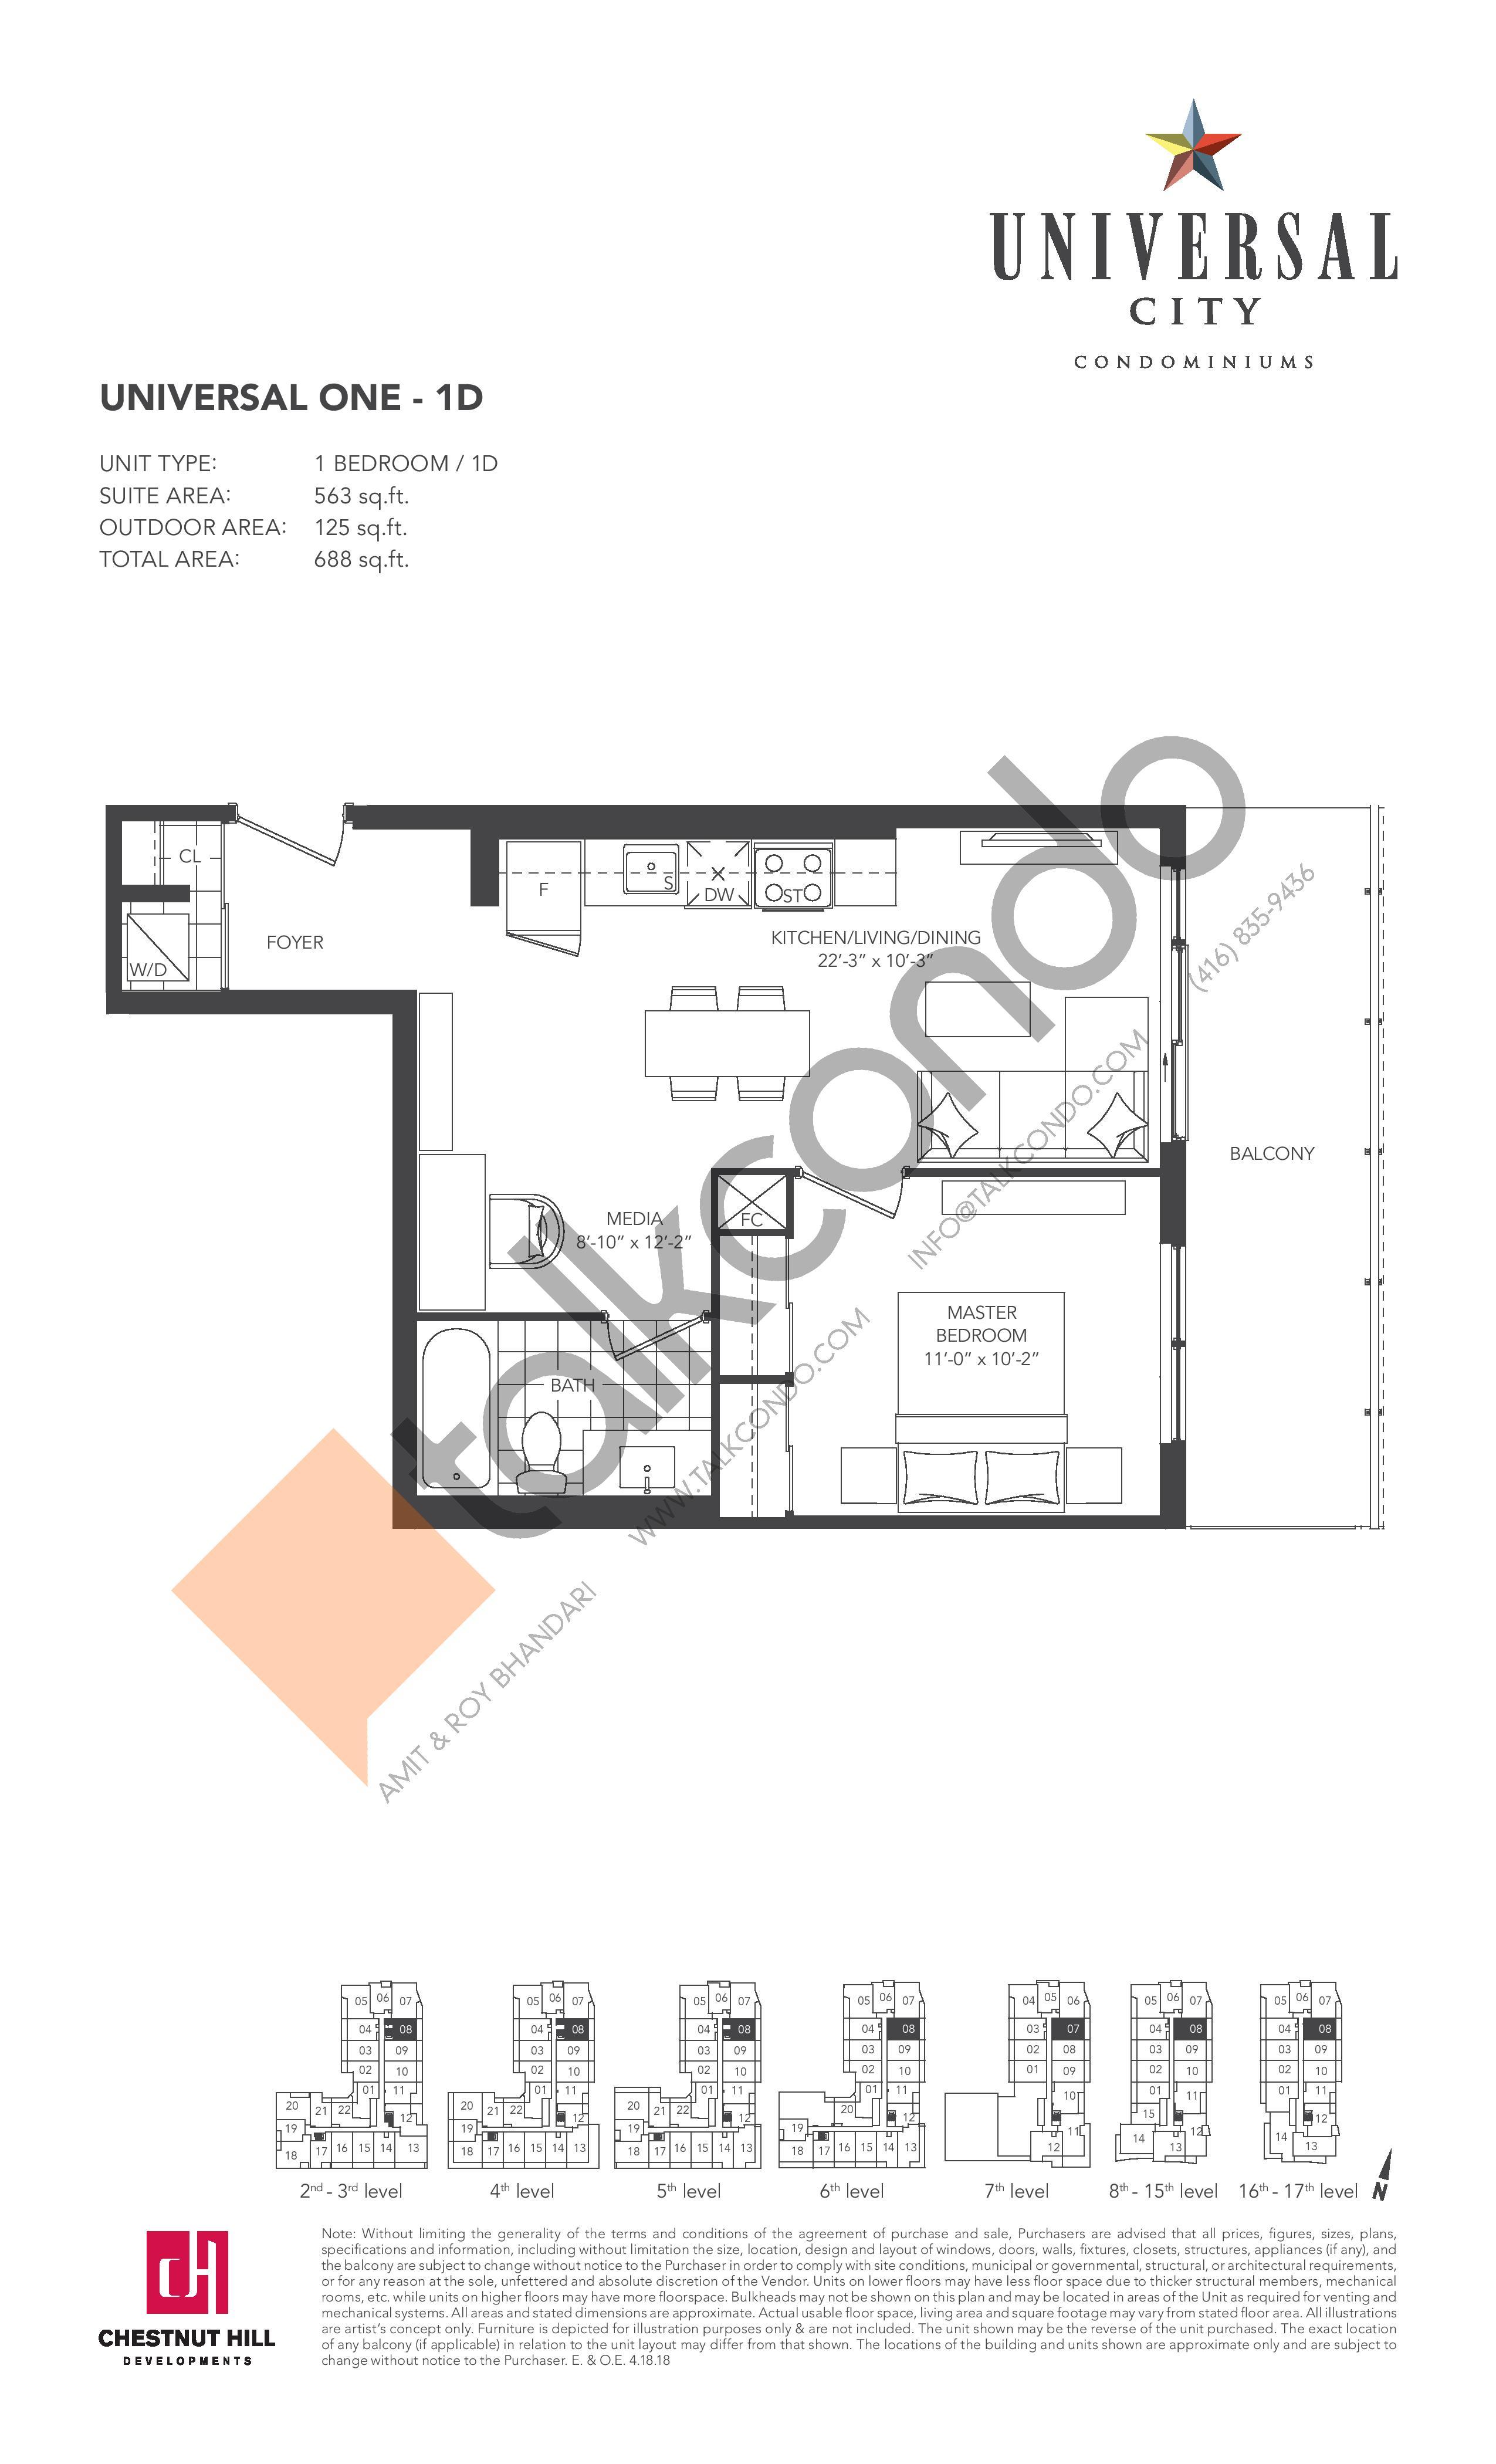 Universal City Condos 2b 786 Sq Ft 2 Bedrooms